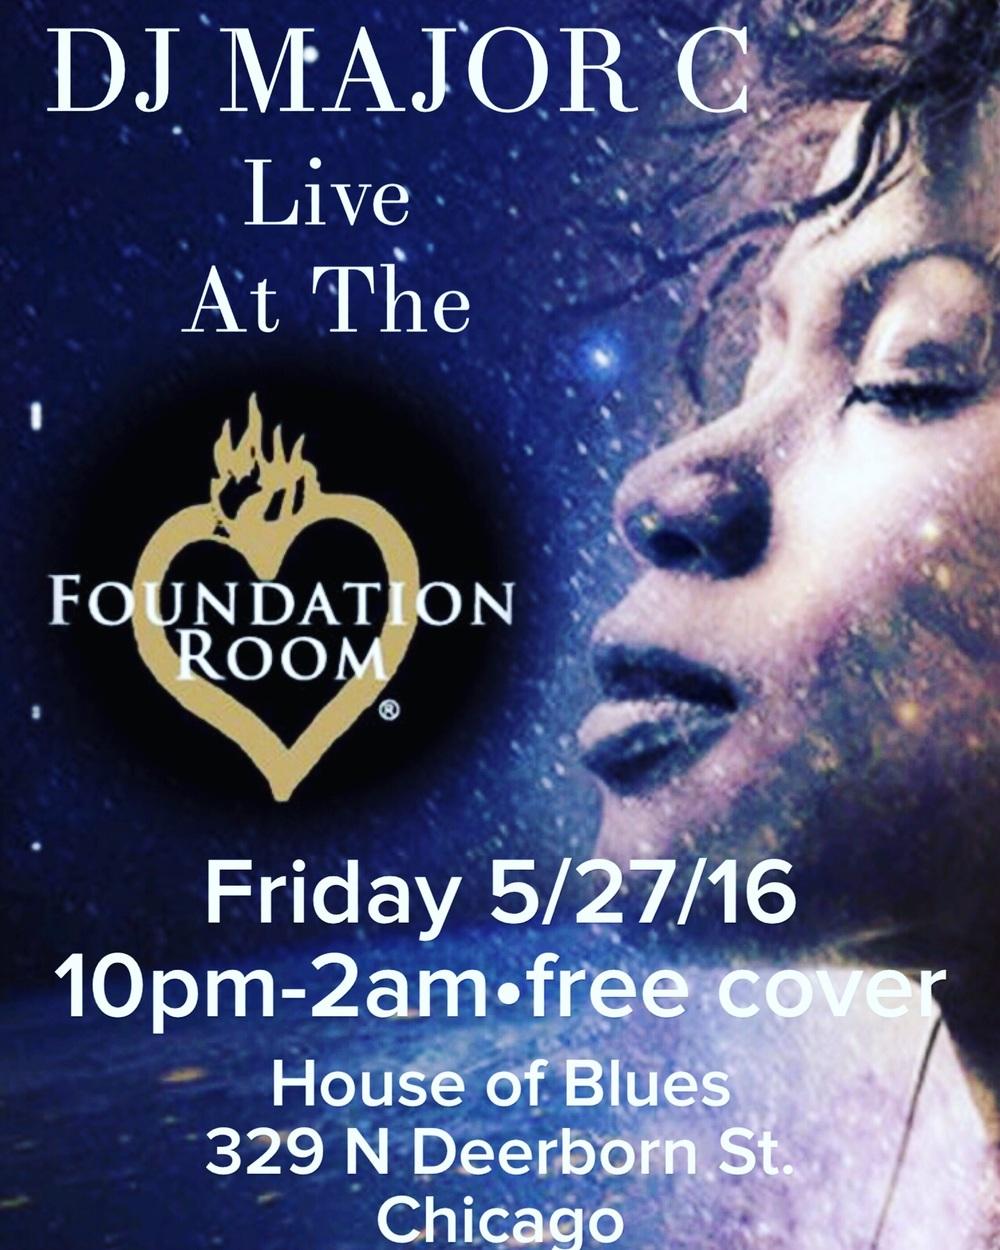 DJ_Major_C_Live_Foundteion_Room